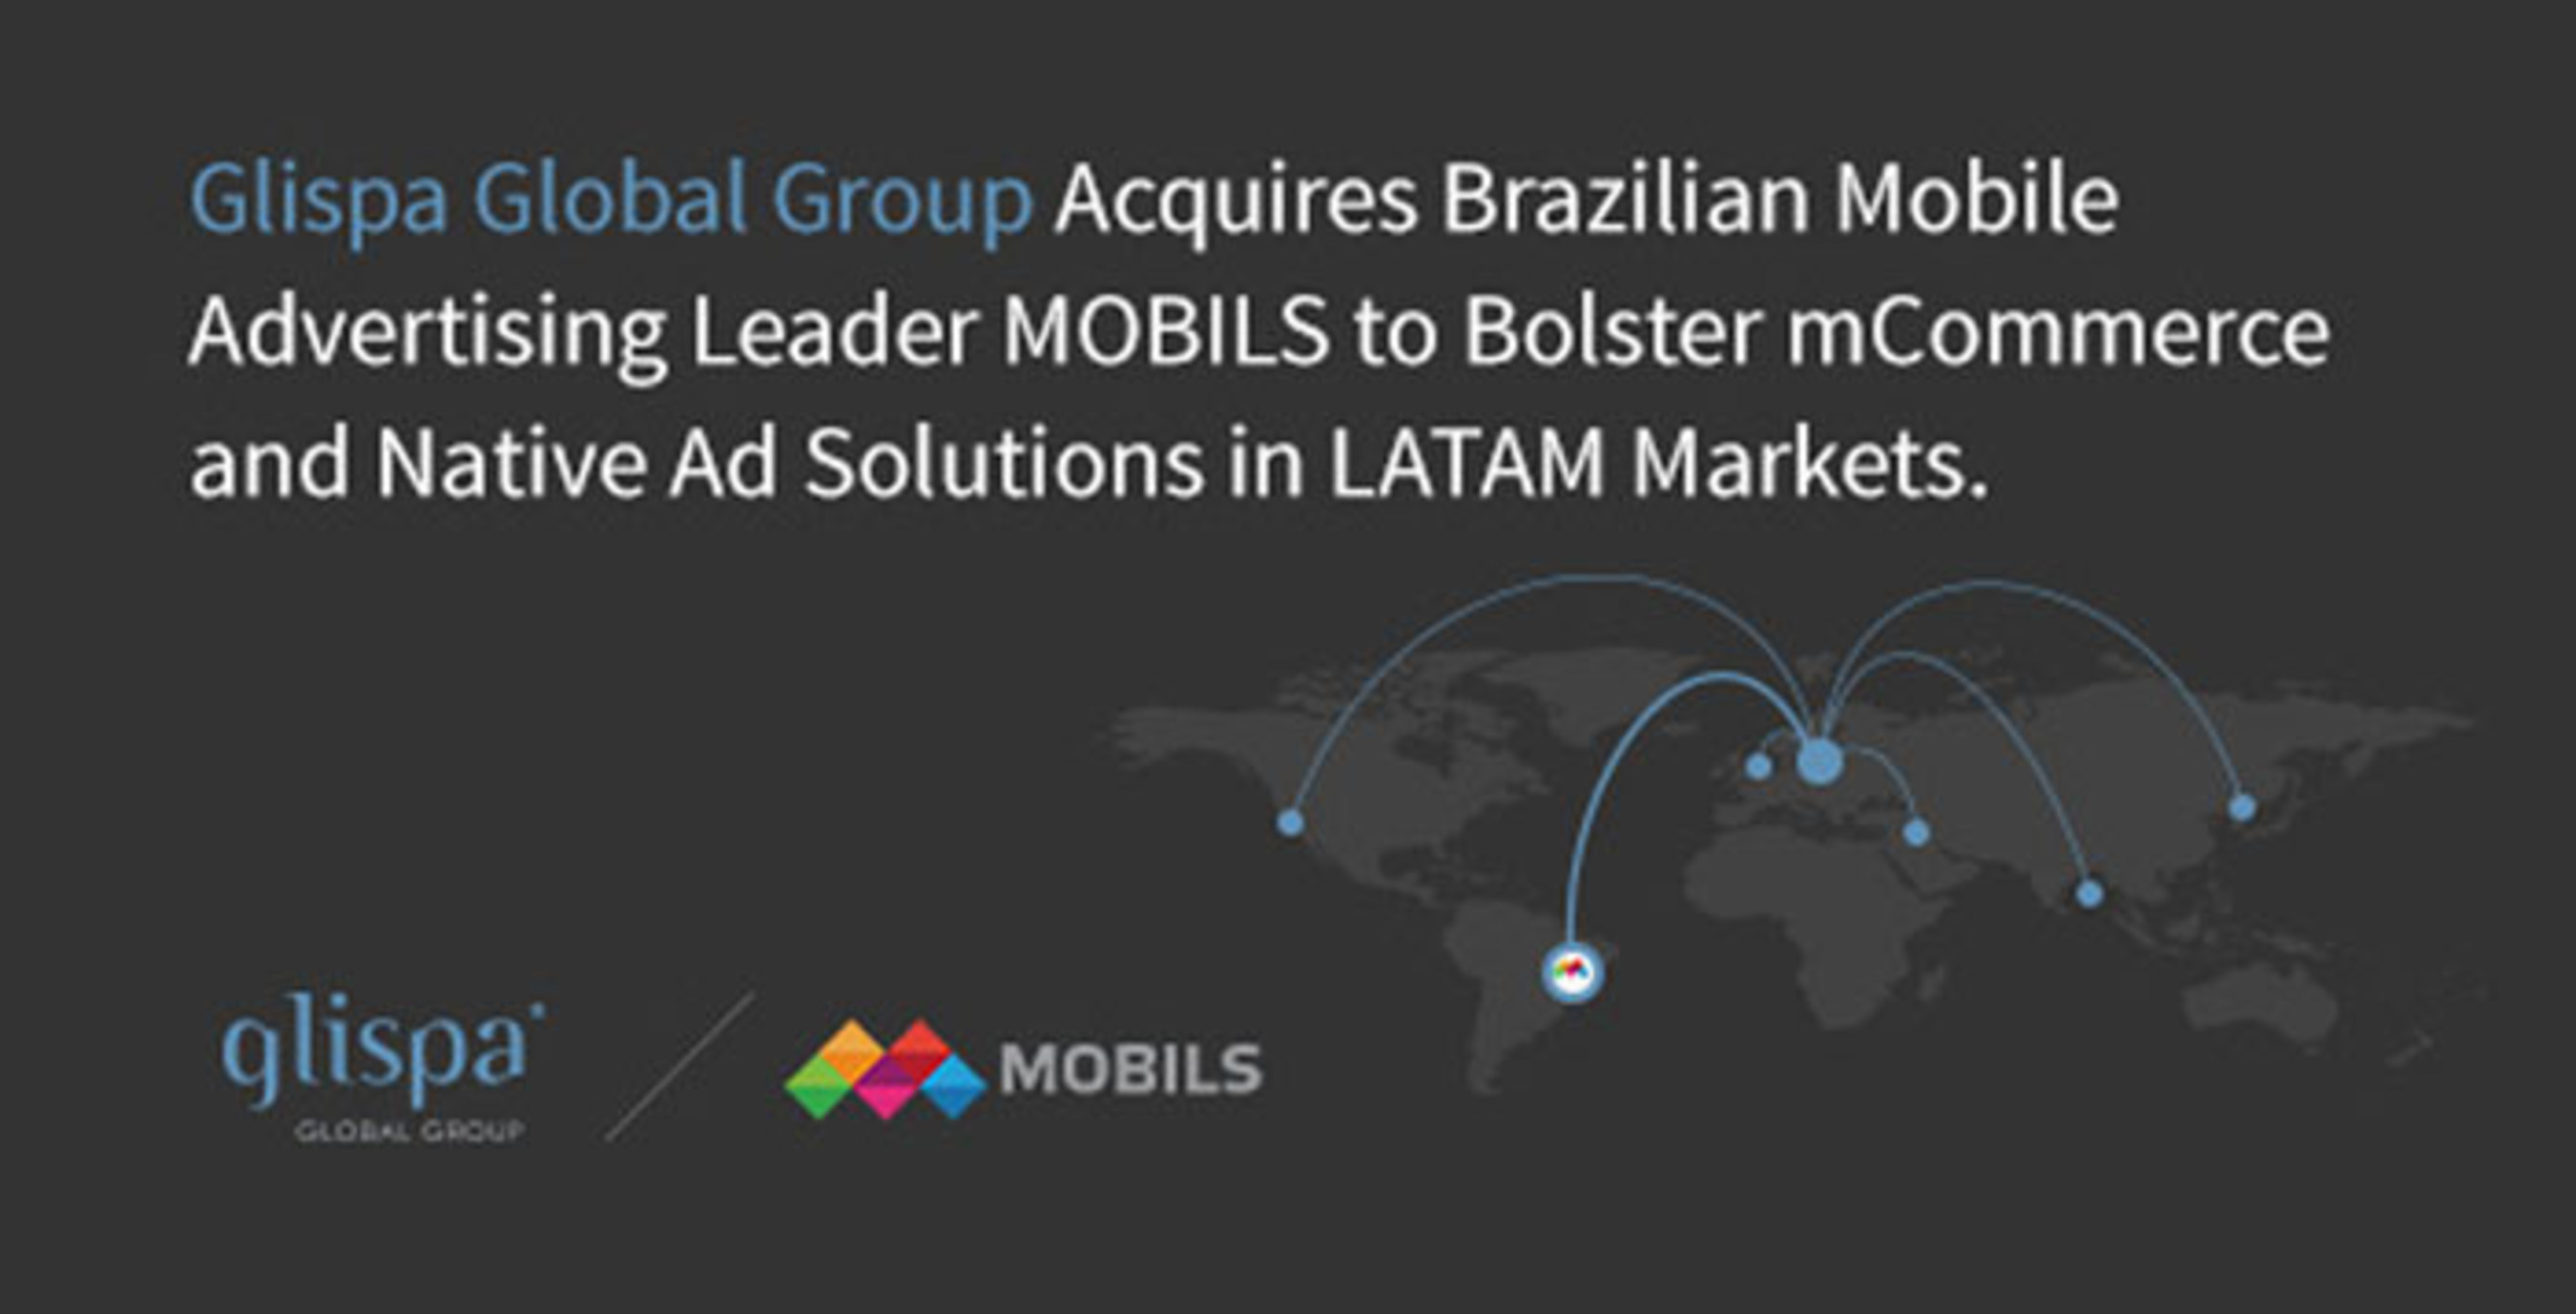 Glispa Global Group Acquires Brazilian Mobile Advertising Leader MOBILS